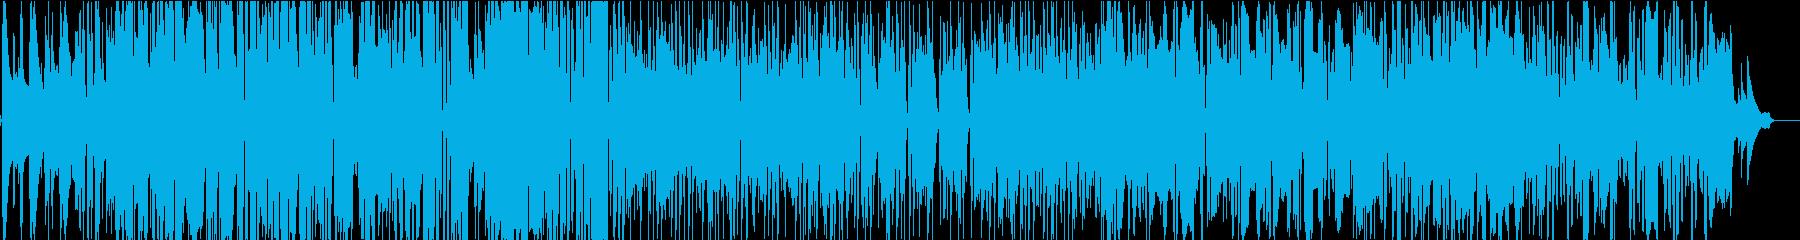 piano・TrpメインJazz_BGMの再生済みの波形